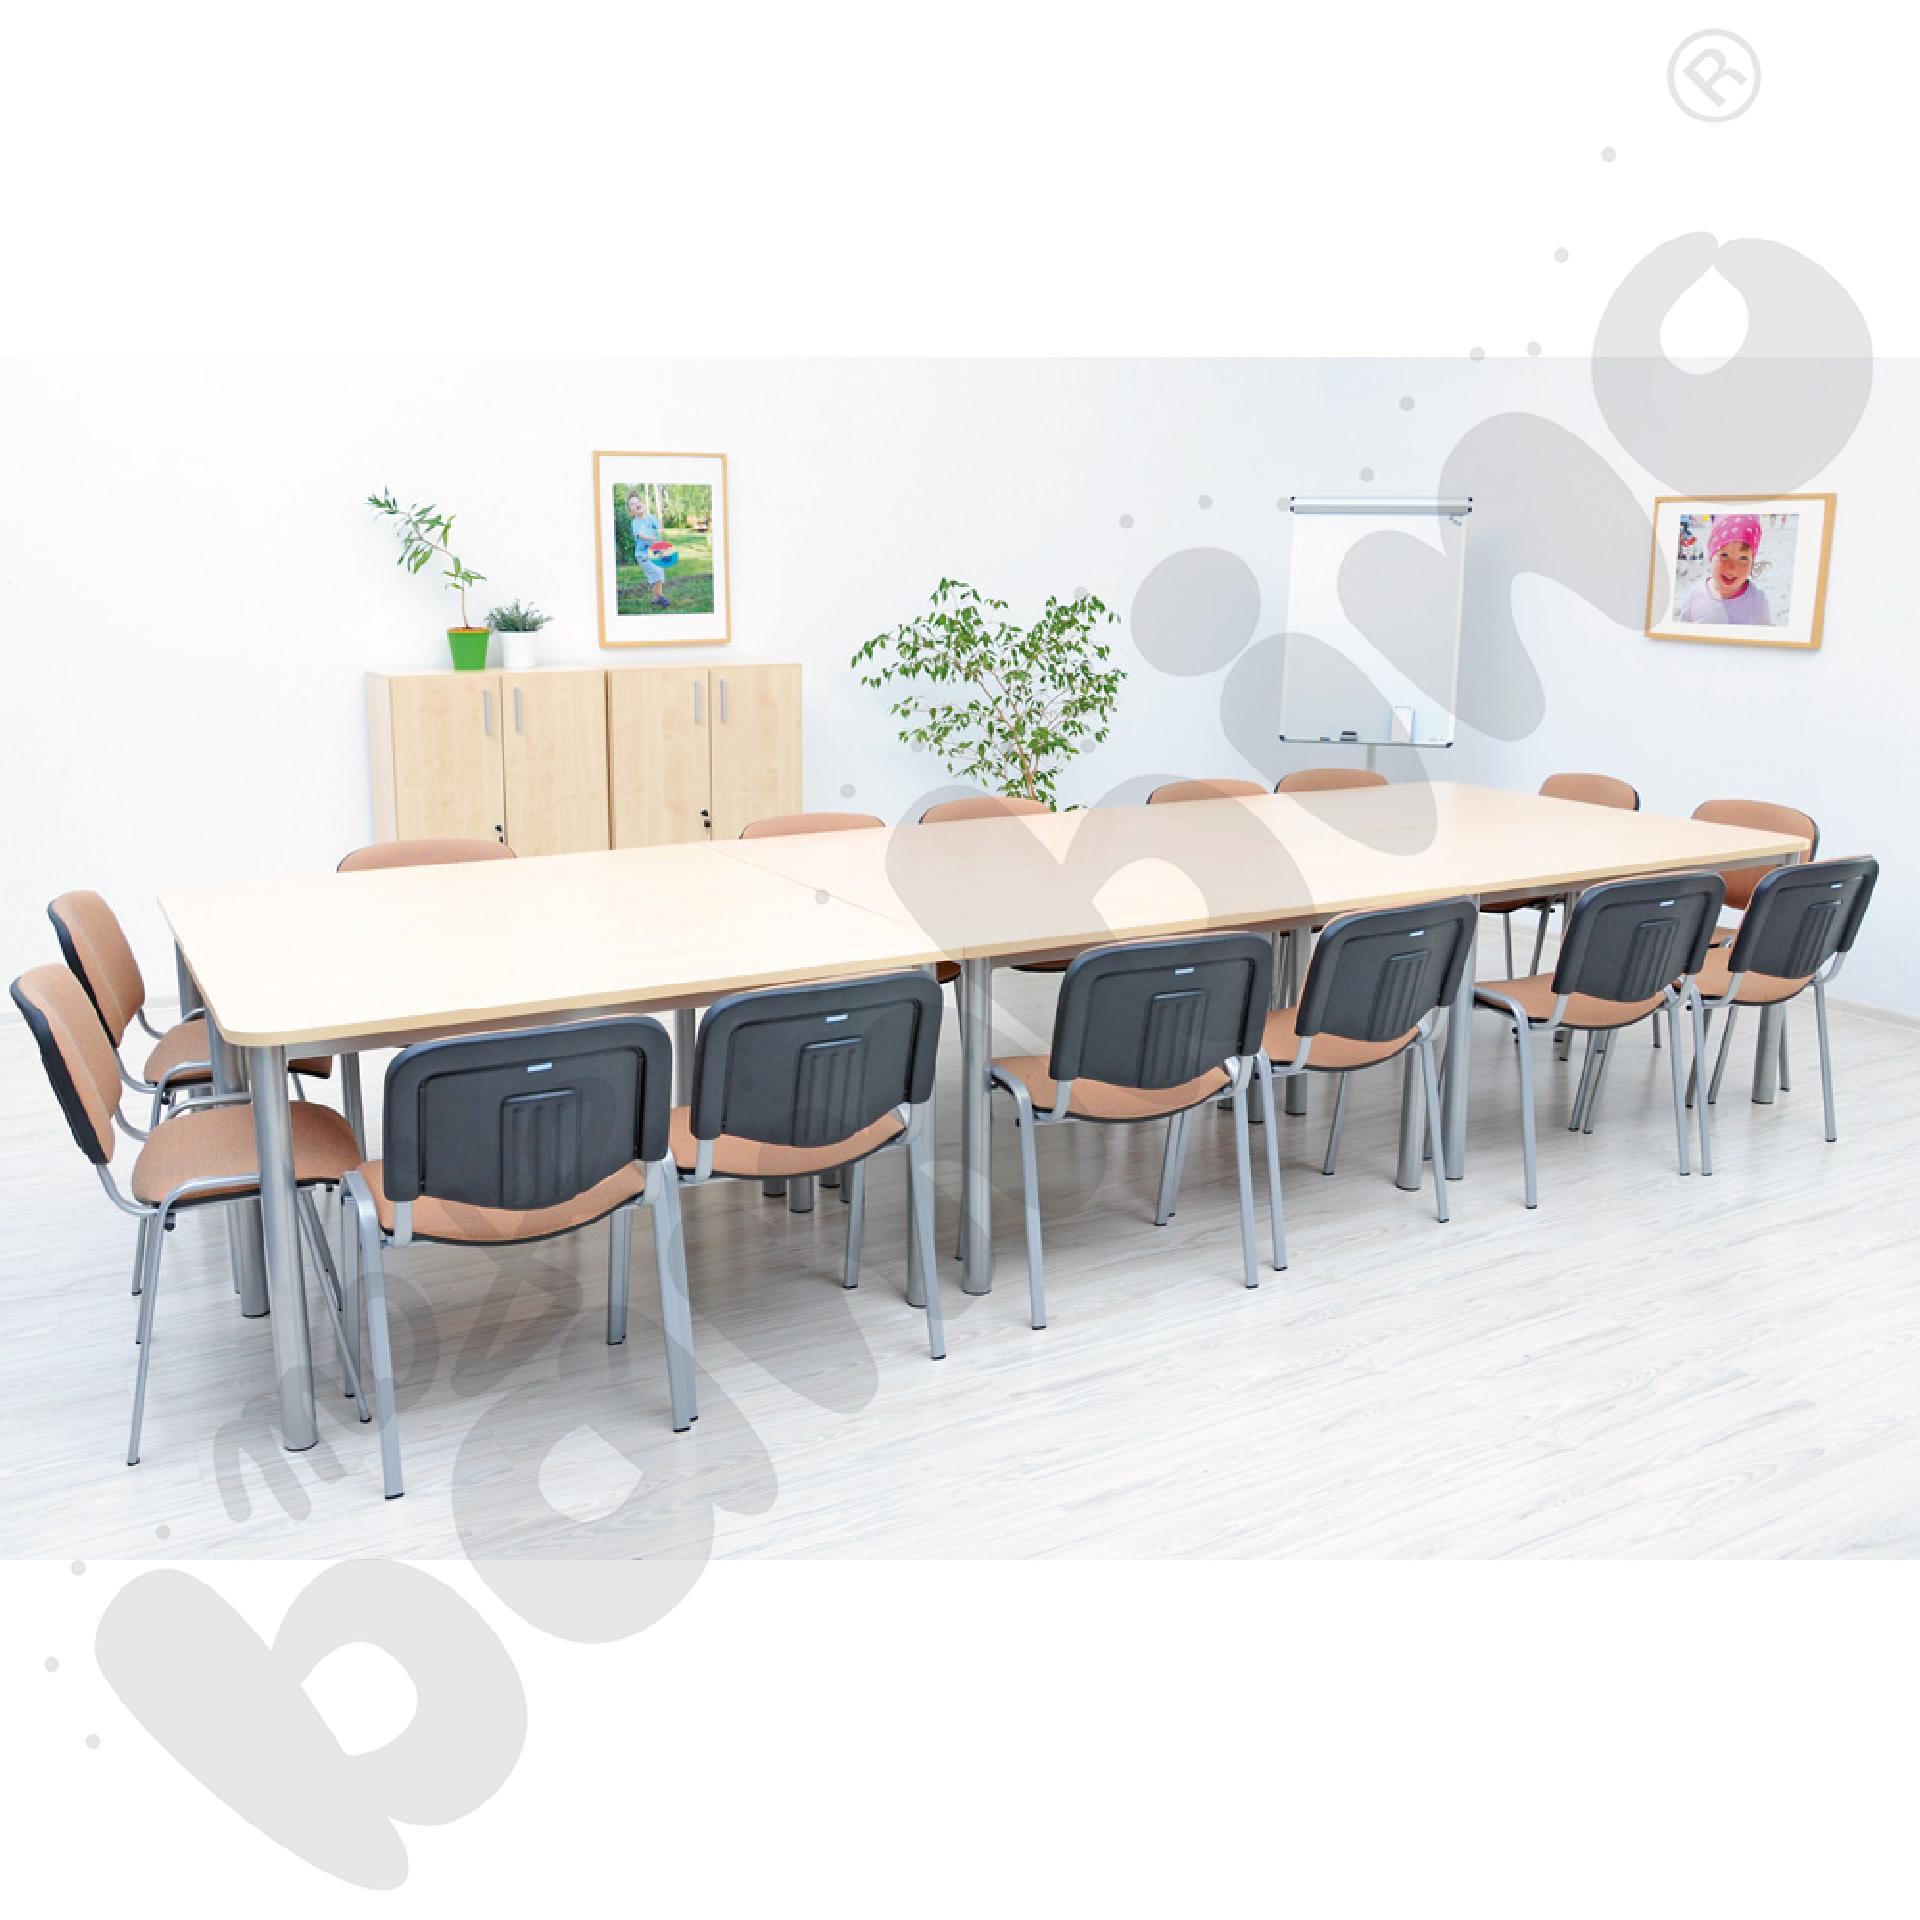 Stół konferencyjny prosty klon